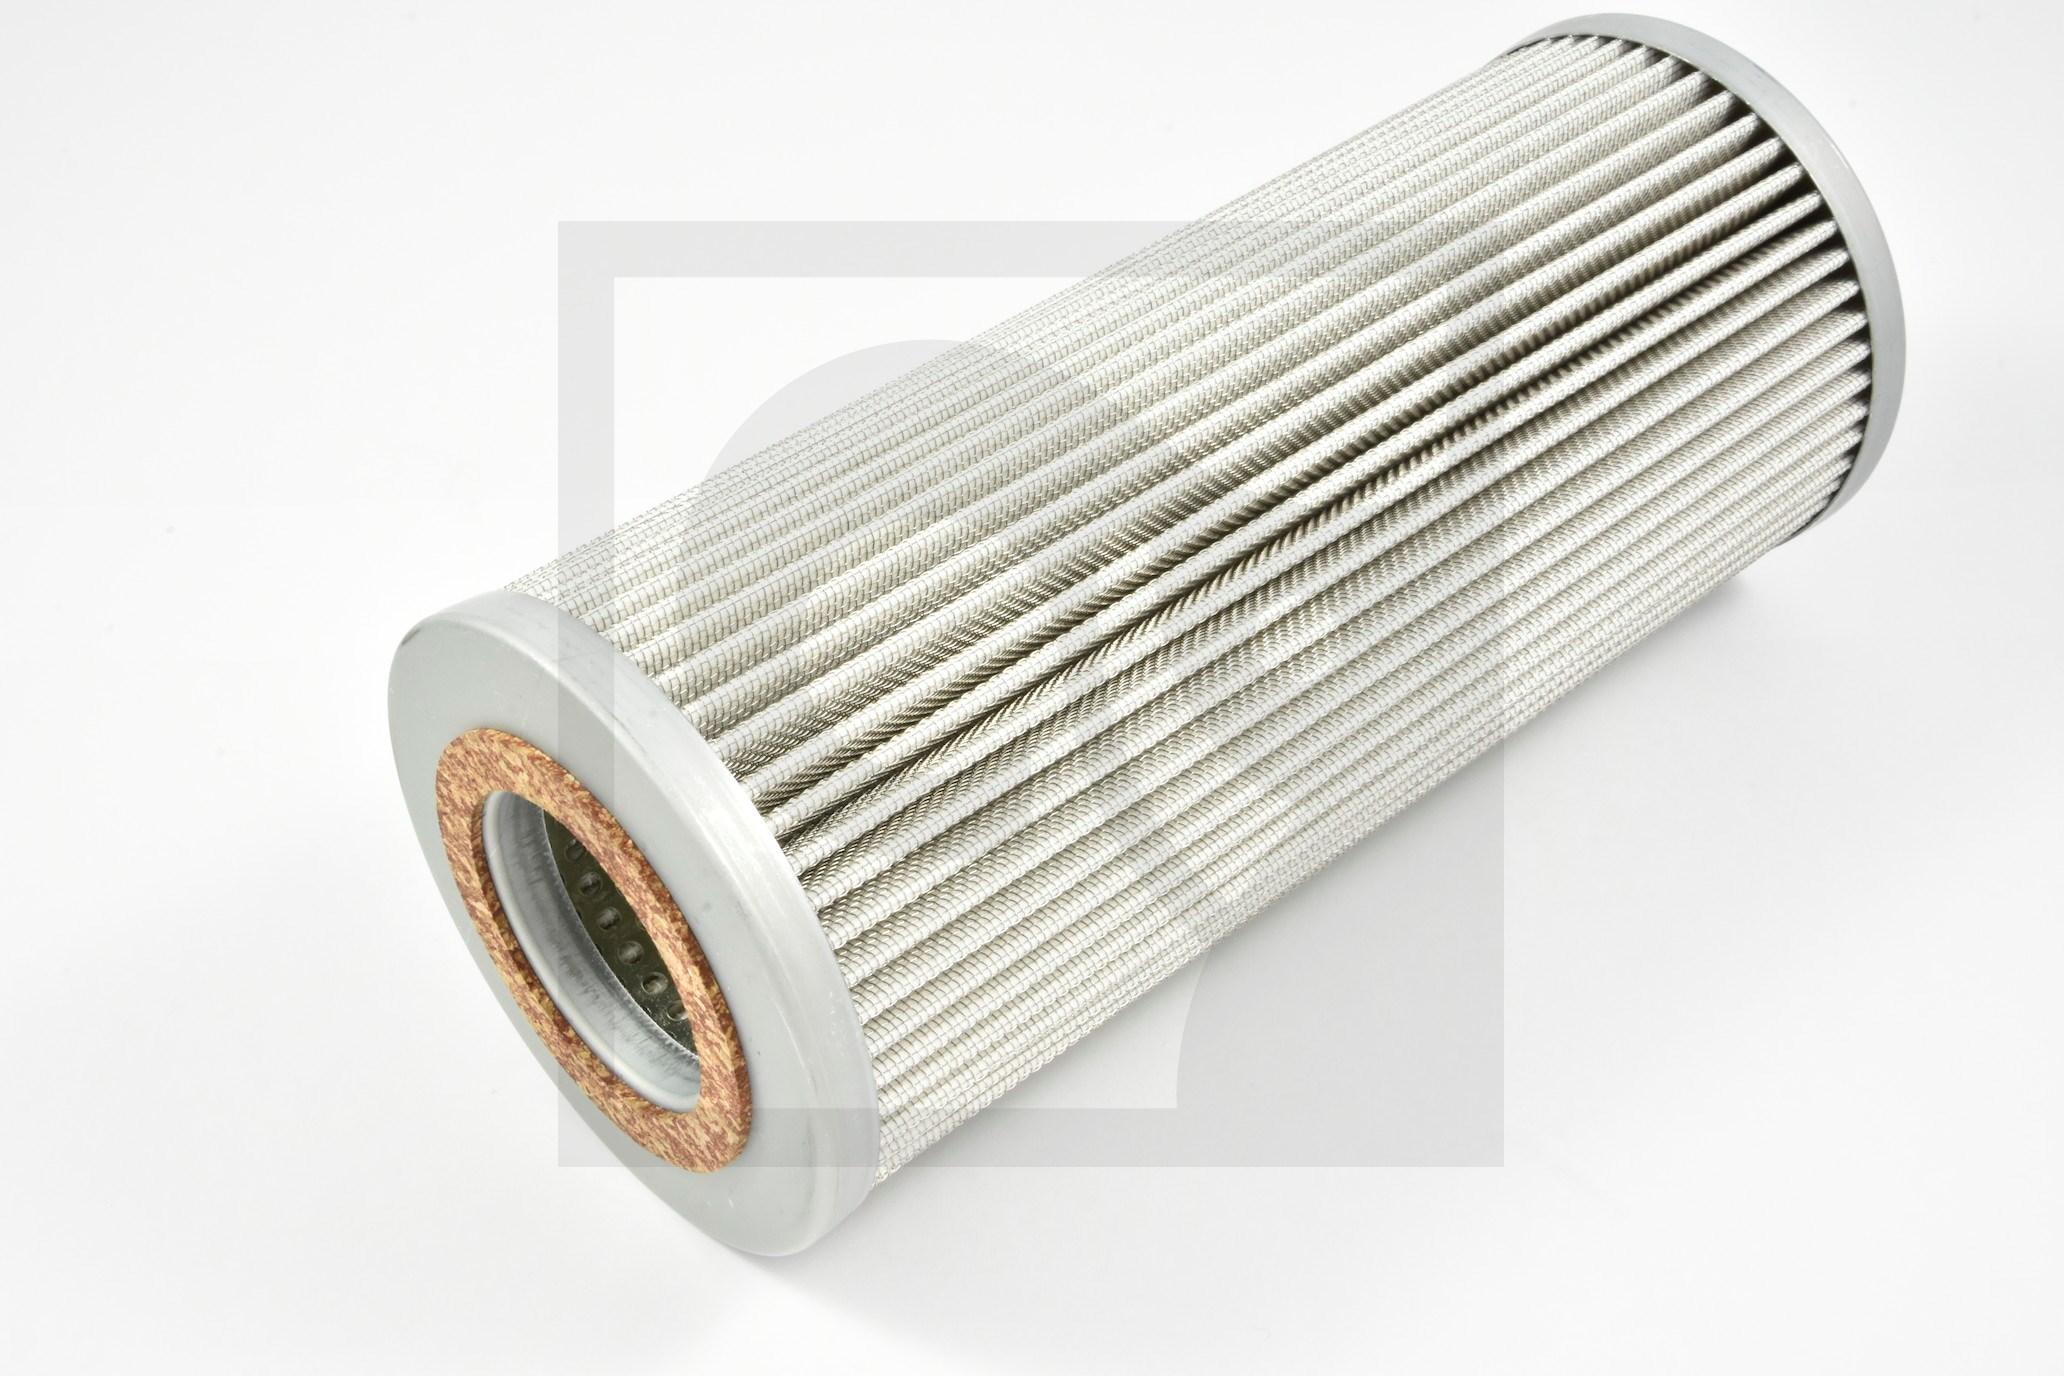 MU83982547_002?preset=list hydraulic pressure filter comp  at mifinder.co